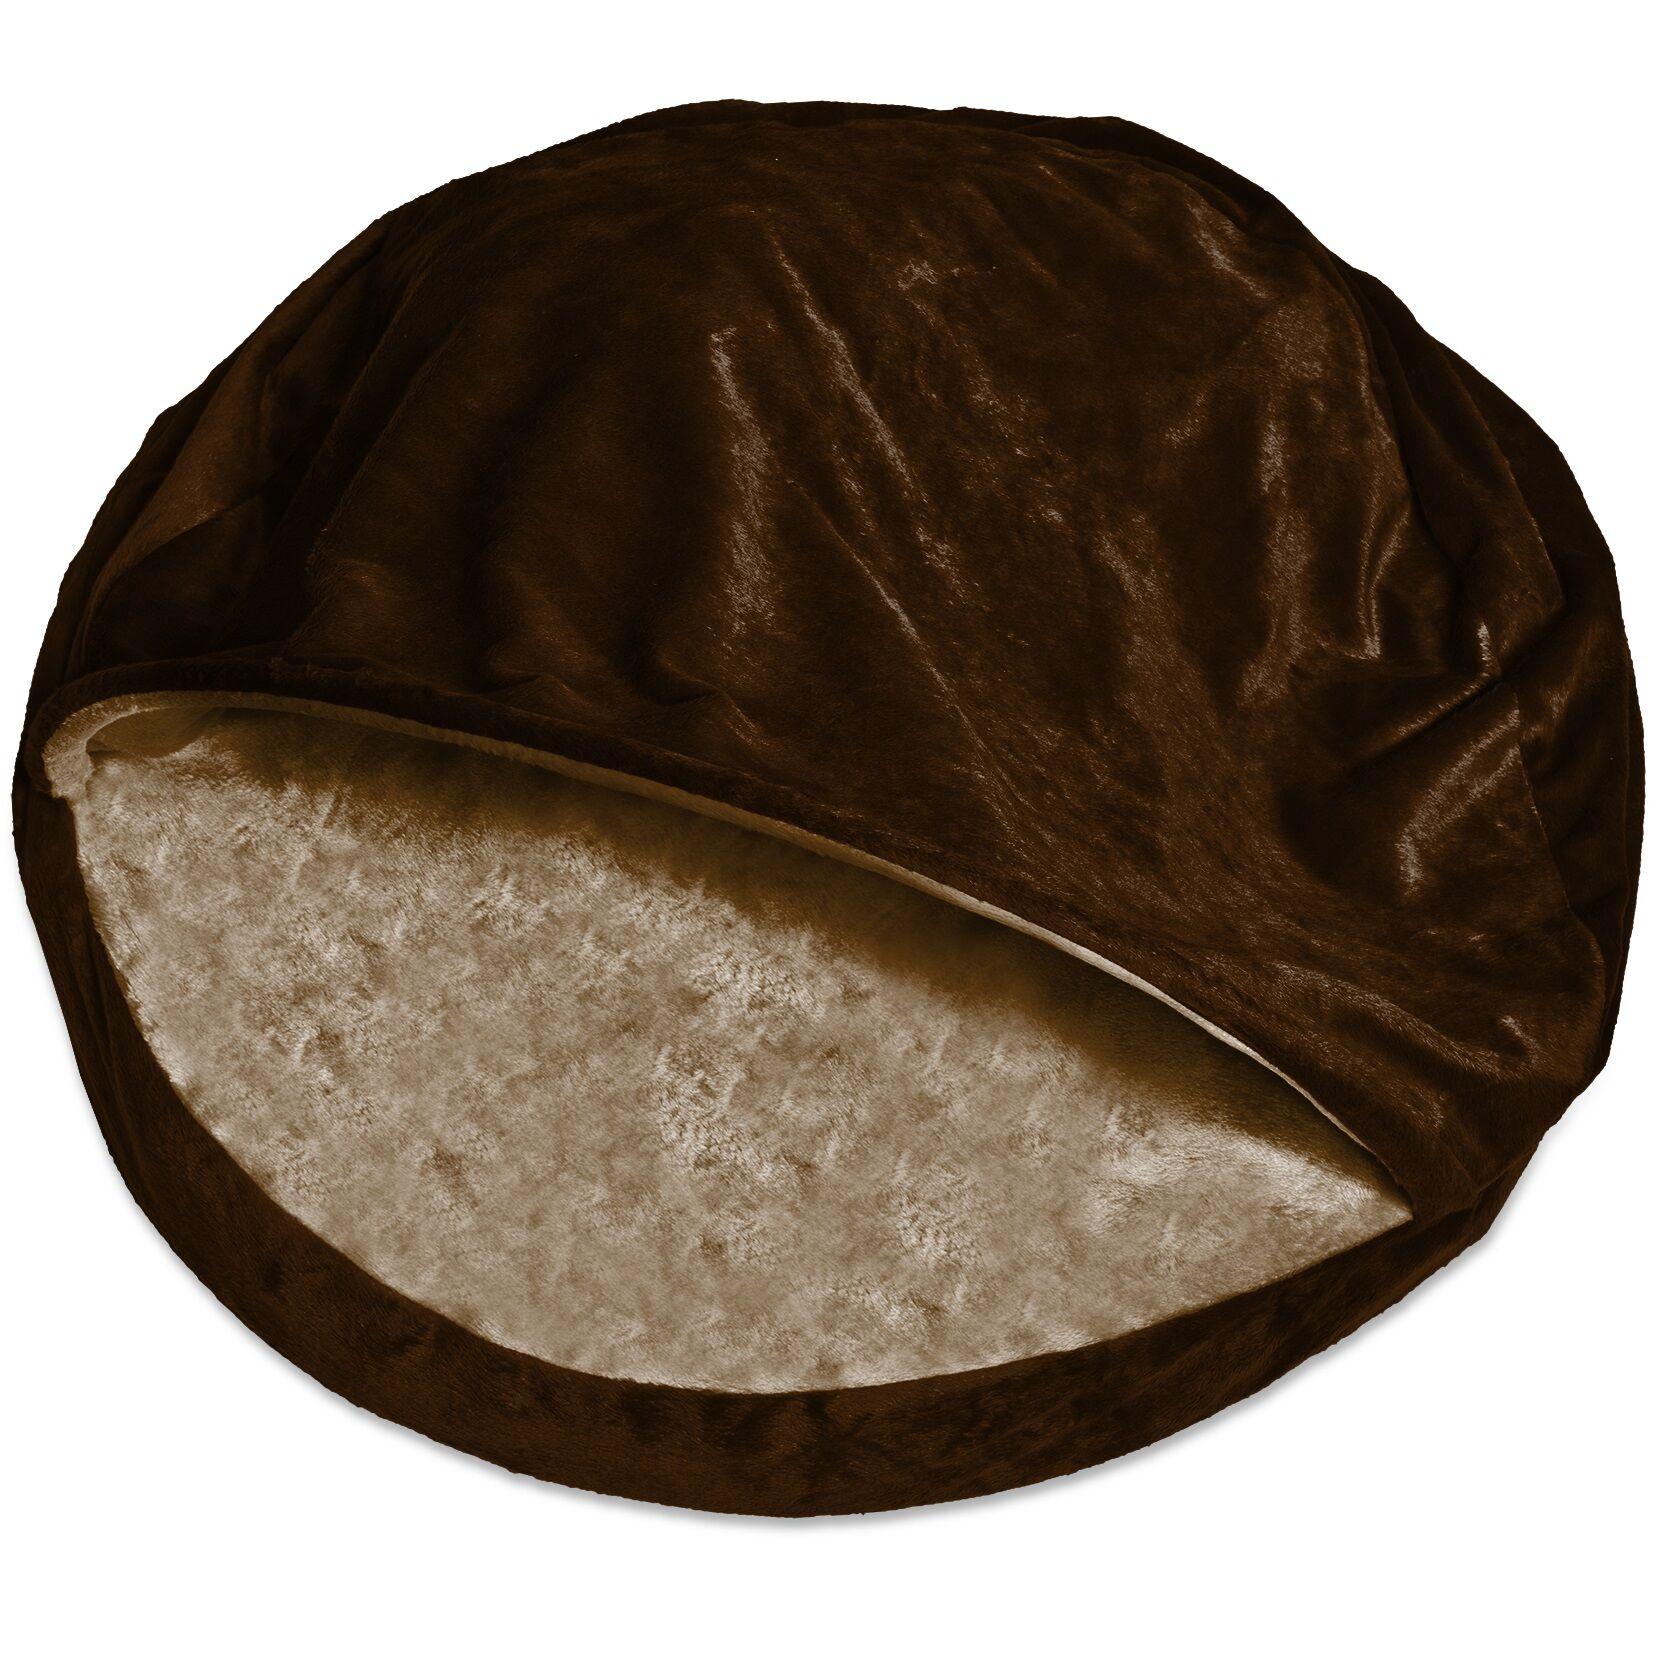 Charlotte Microvelvet Snuggly Dog Cave Bed Hooded Color: Espresso, Size: Large (35